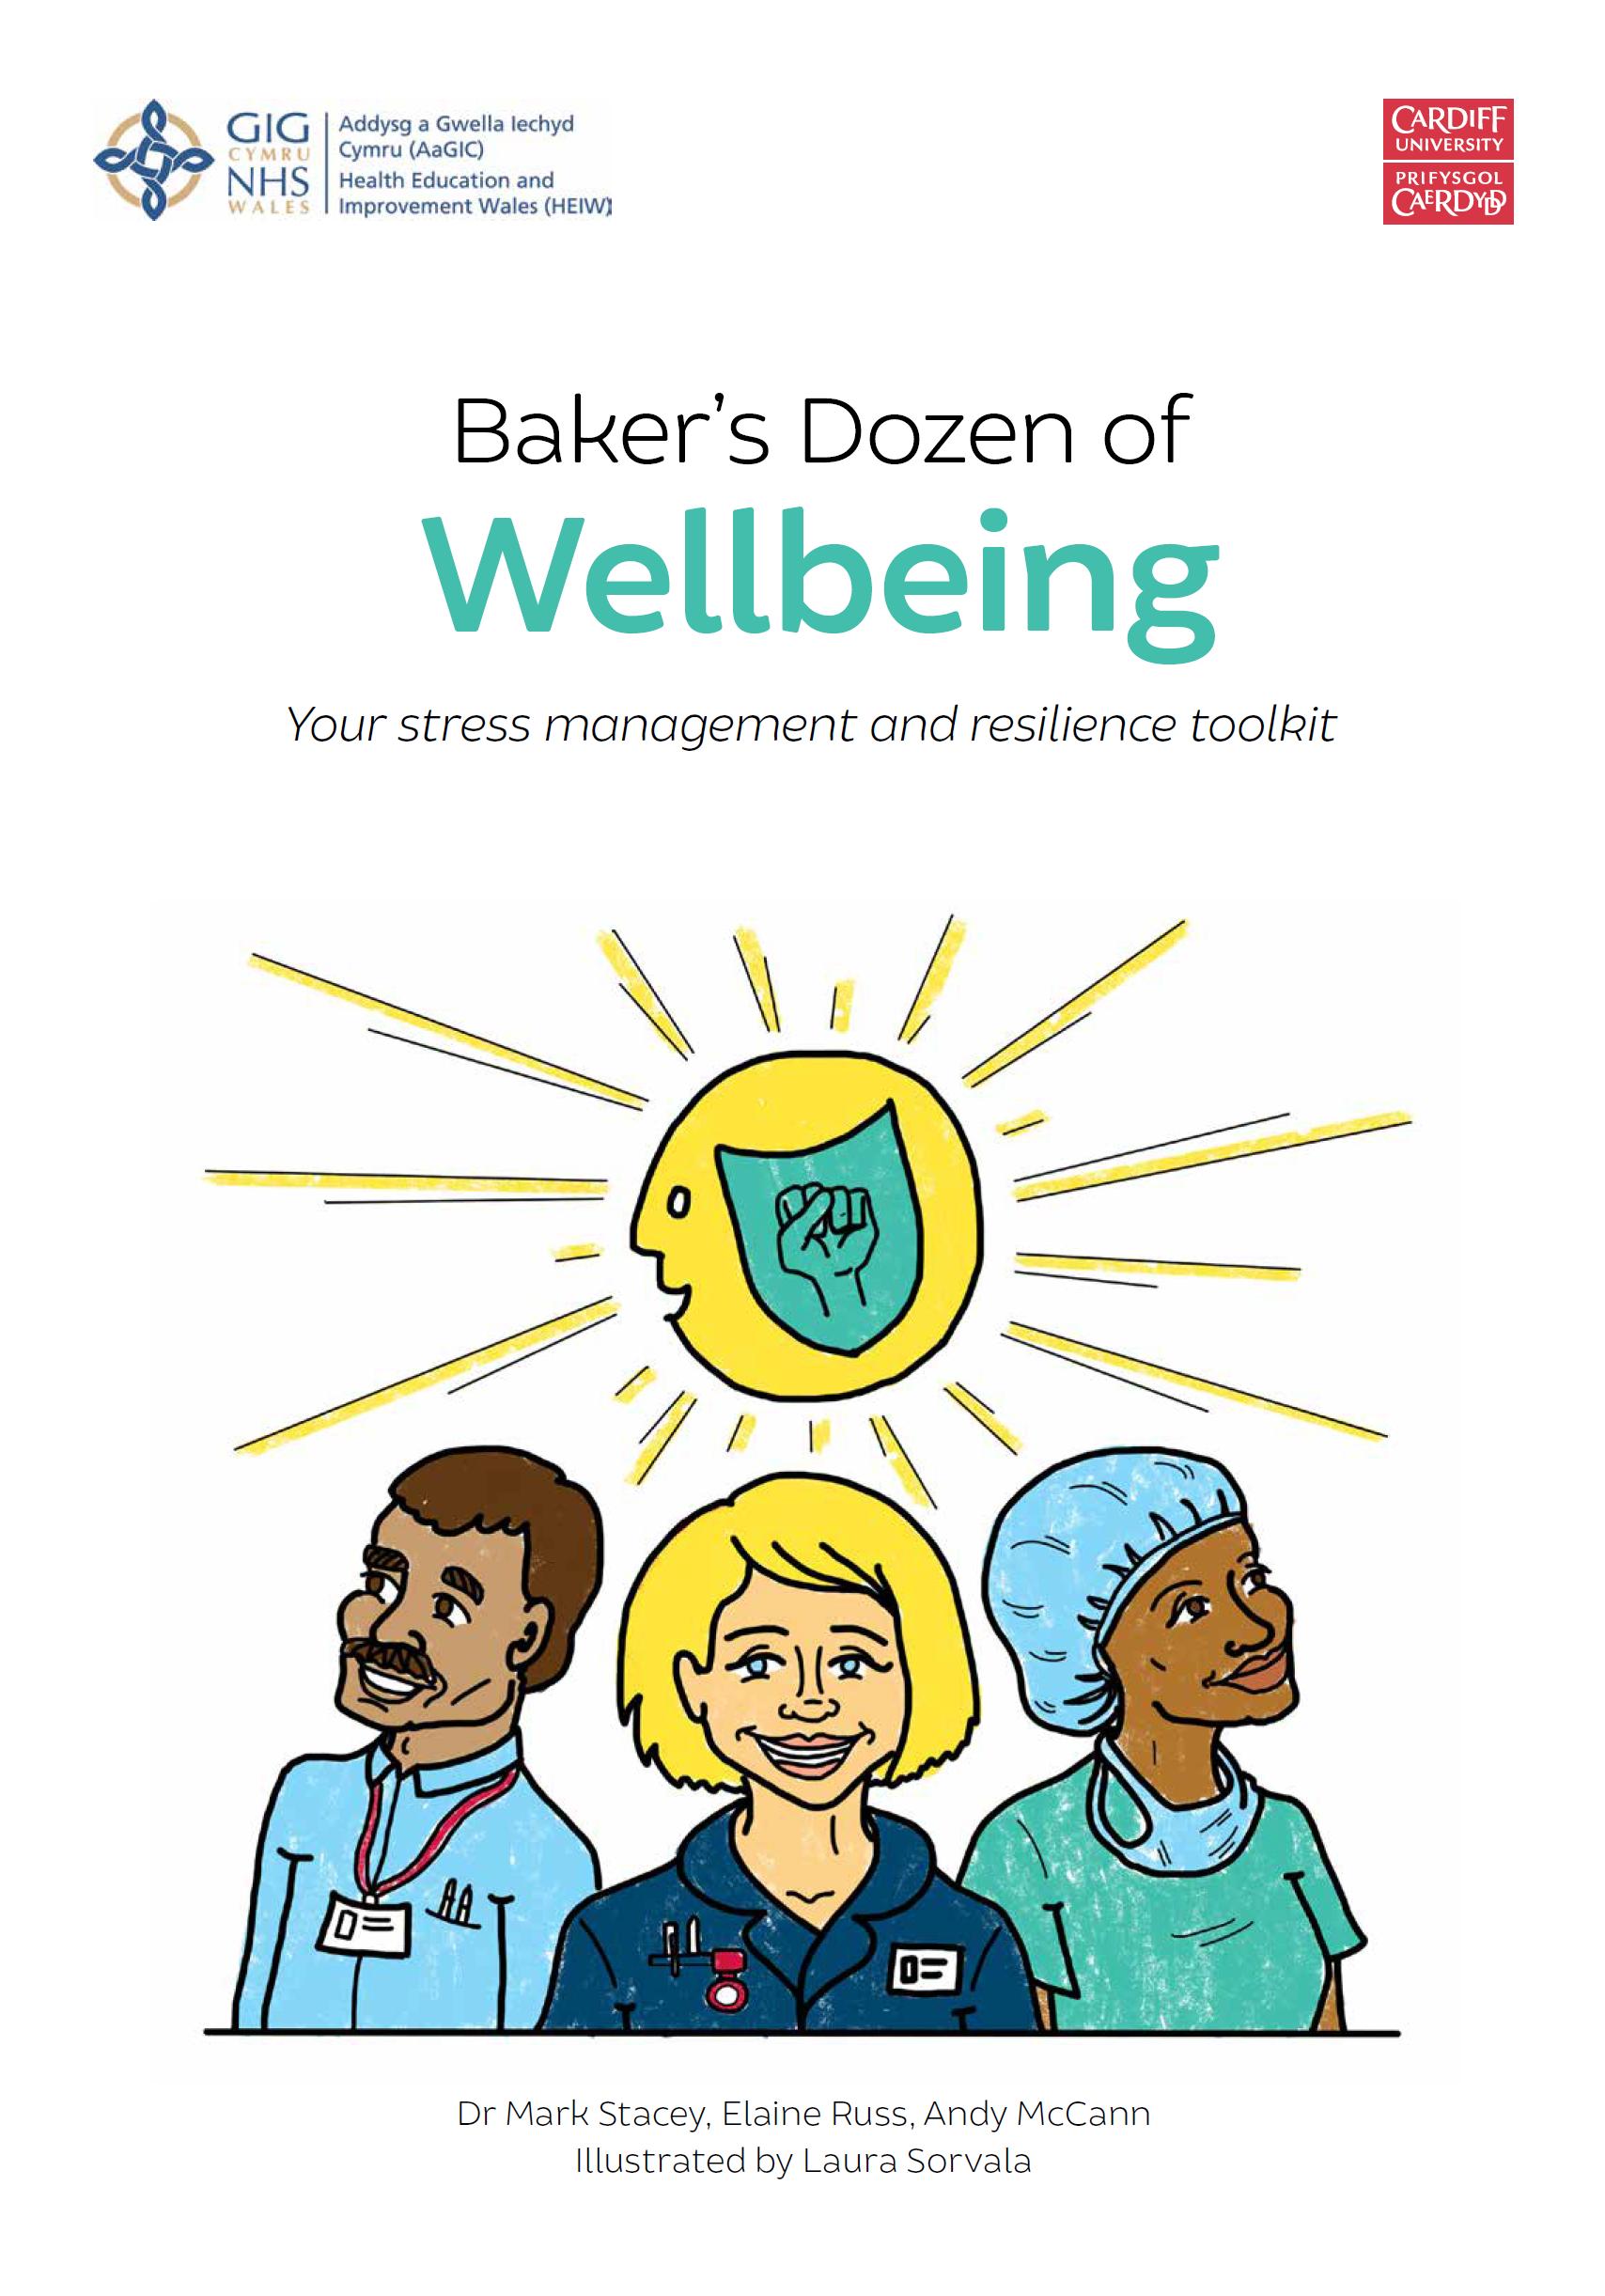 Baker's Dozen of wellbeing